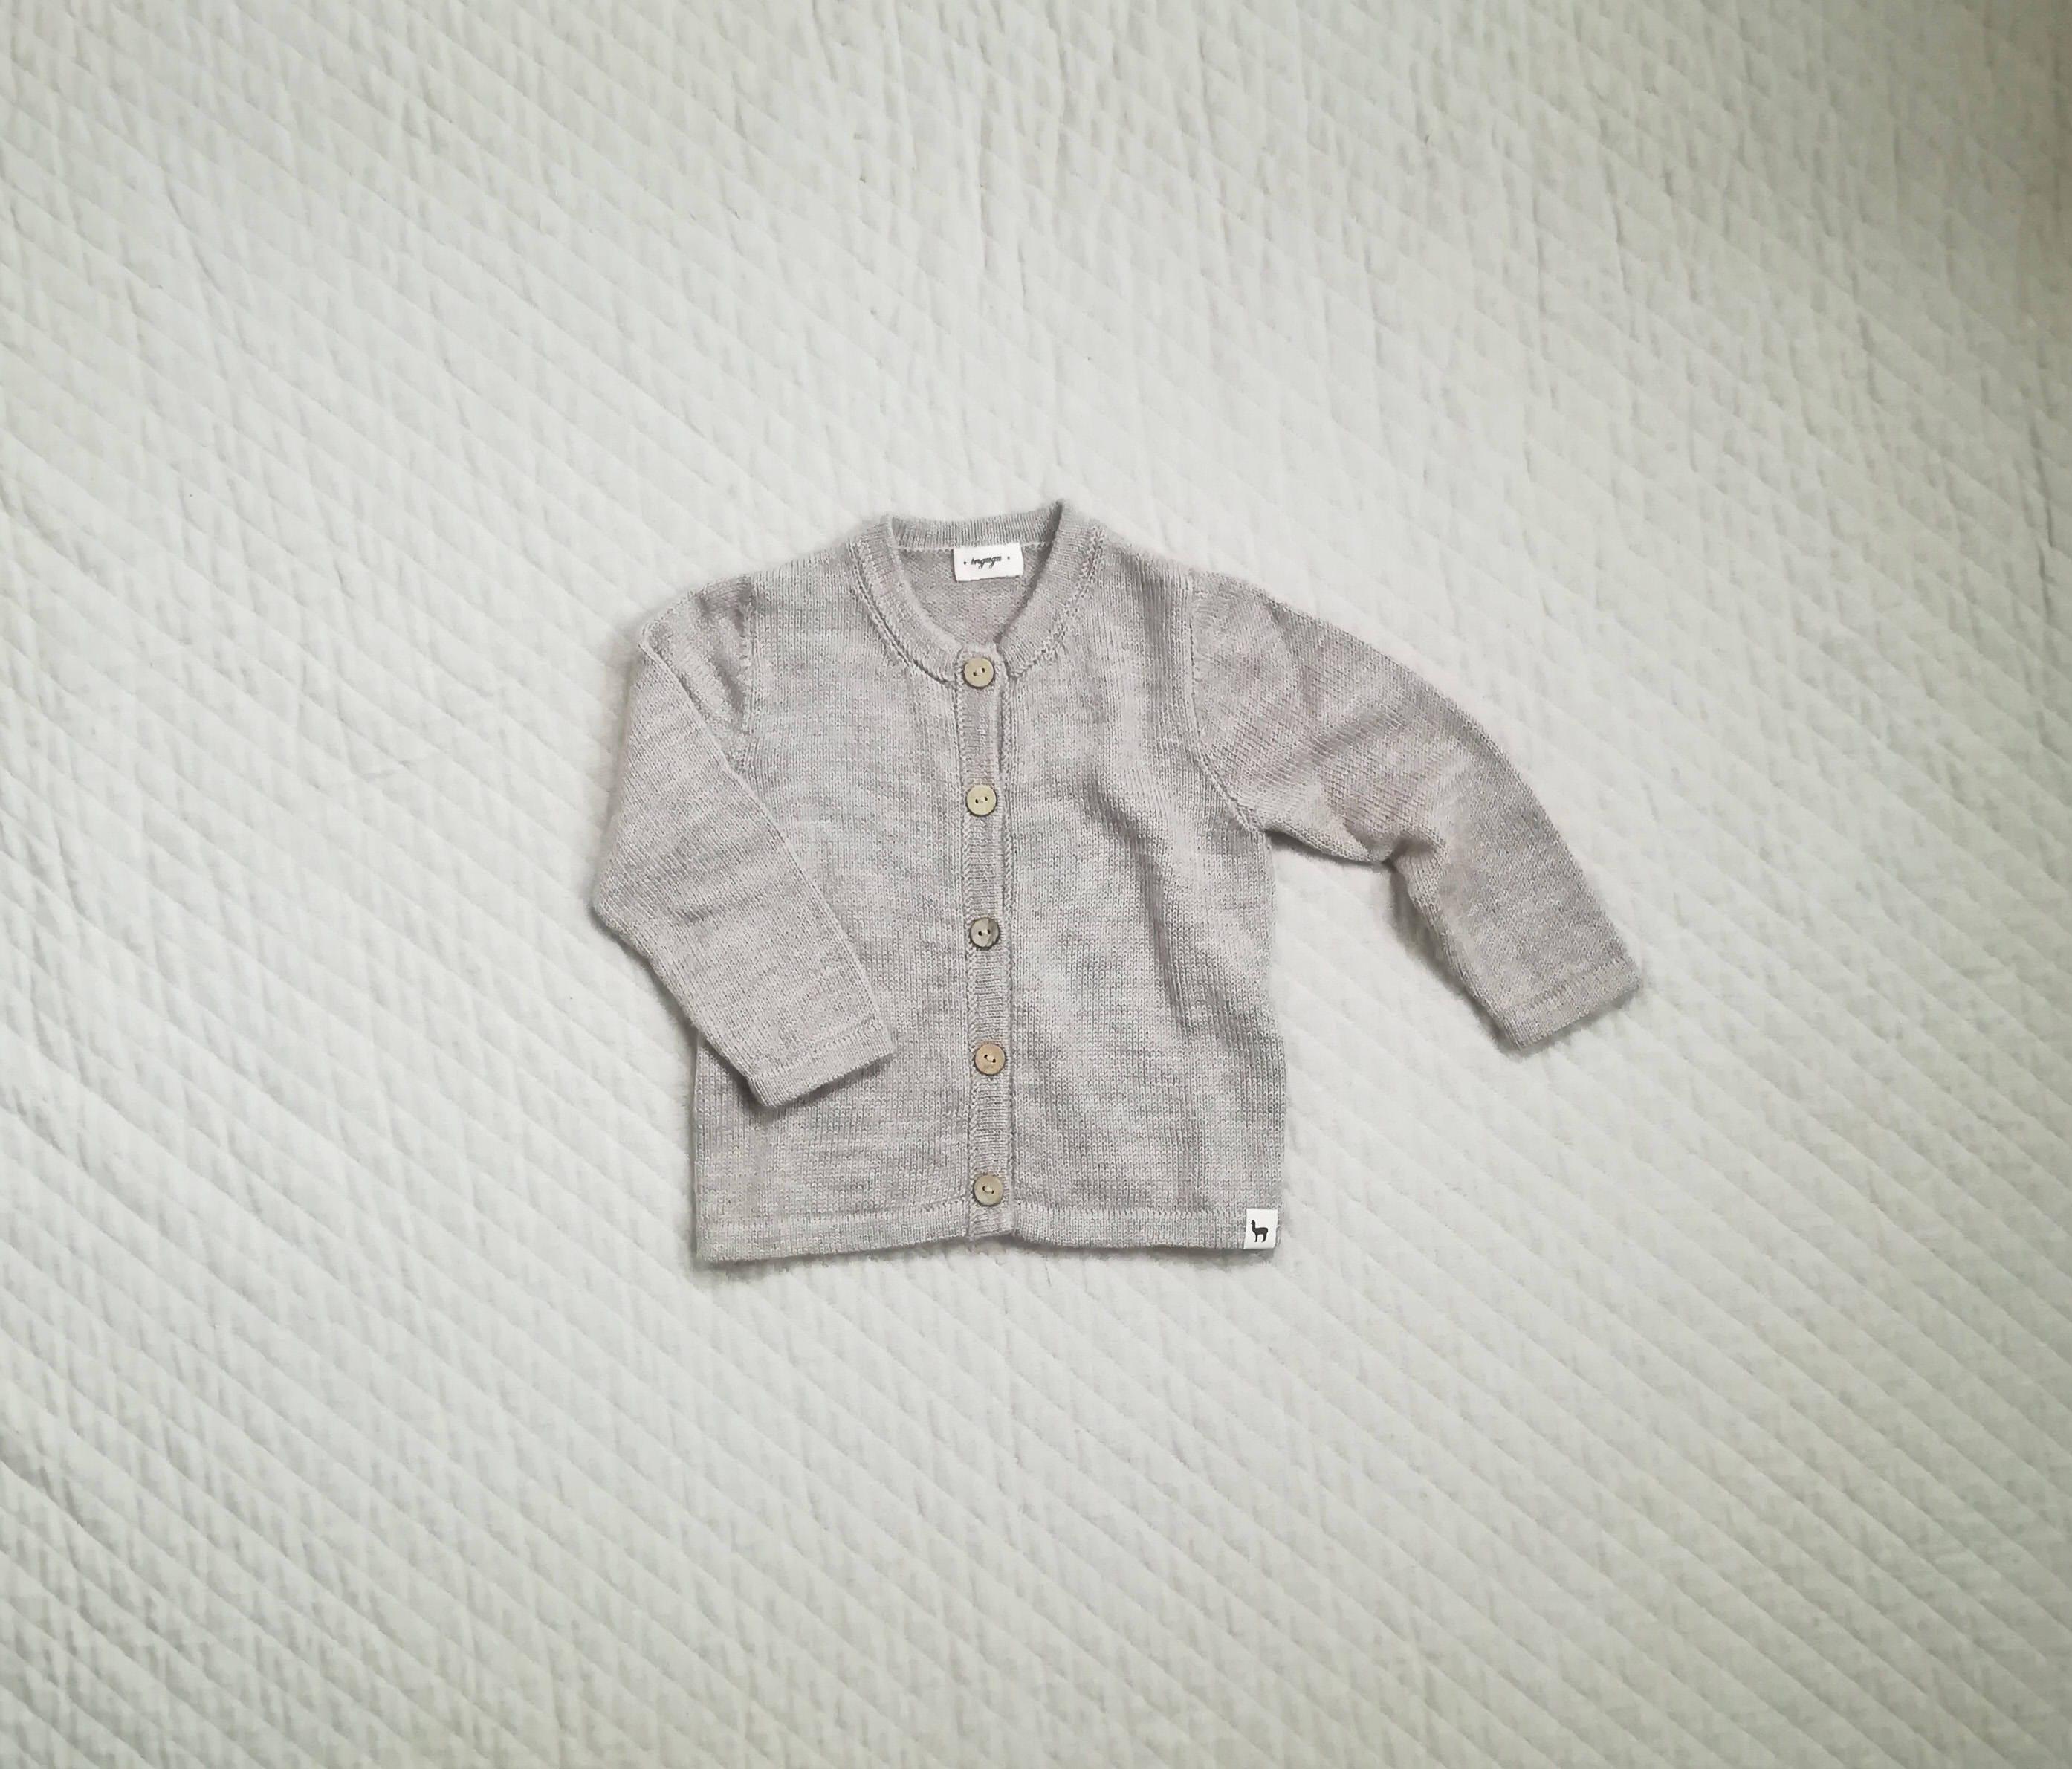 da84c9dc4 Baby cardigan kids alpaca boy sweater girl sweater knitted wool ...